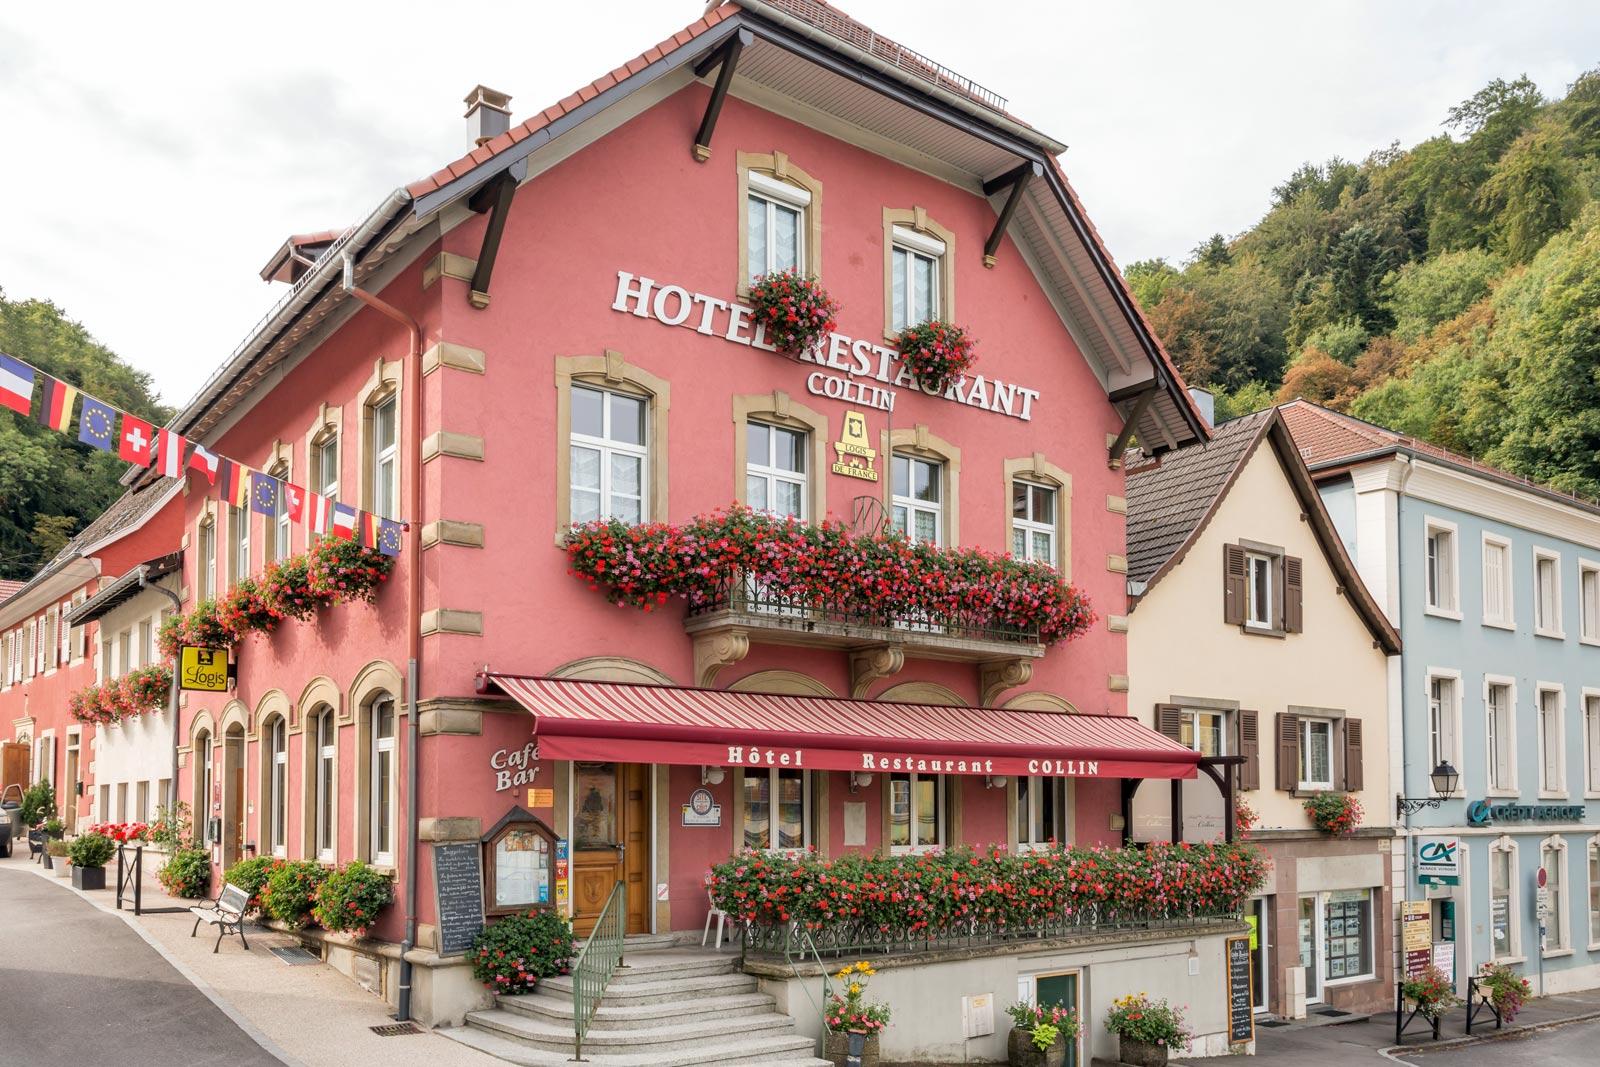 Hôtel-Restaurant Collin Ferrette